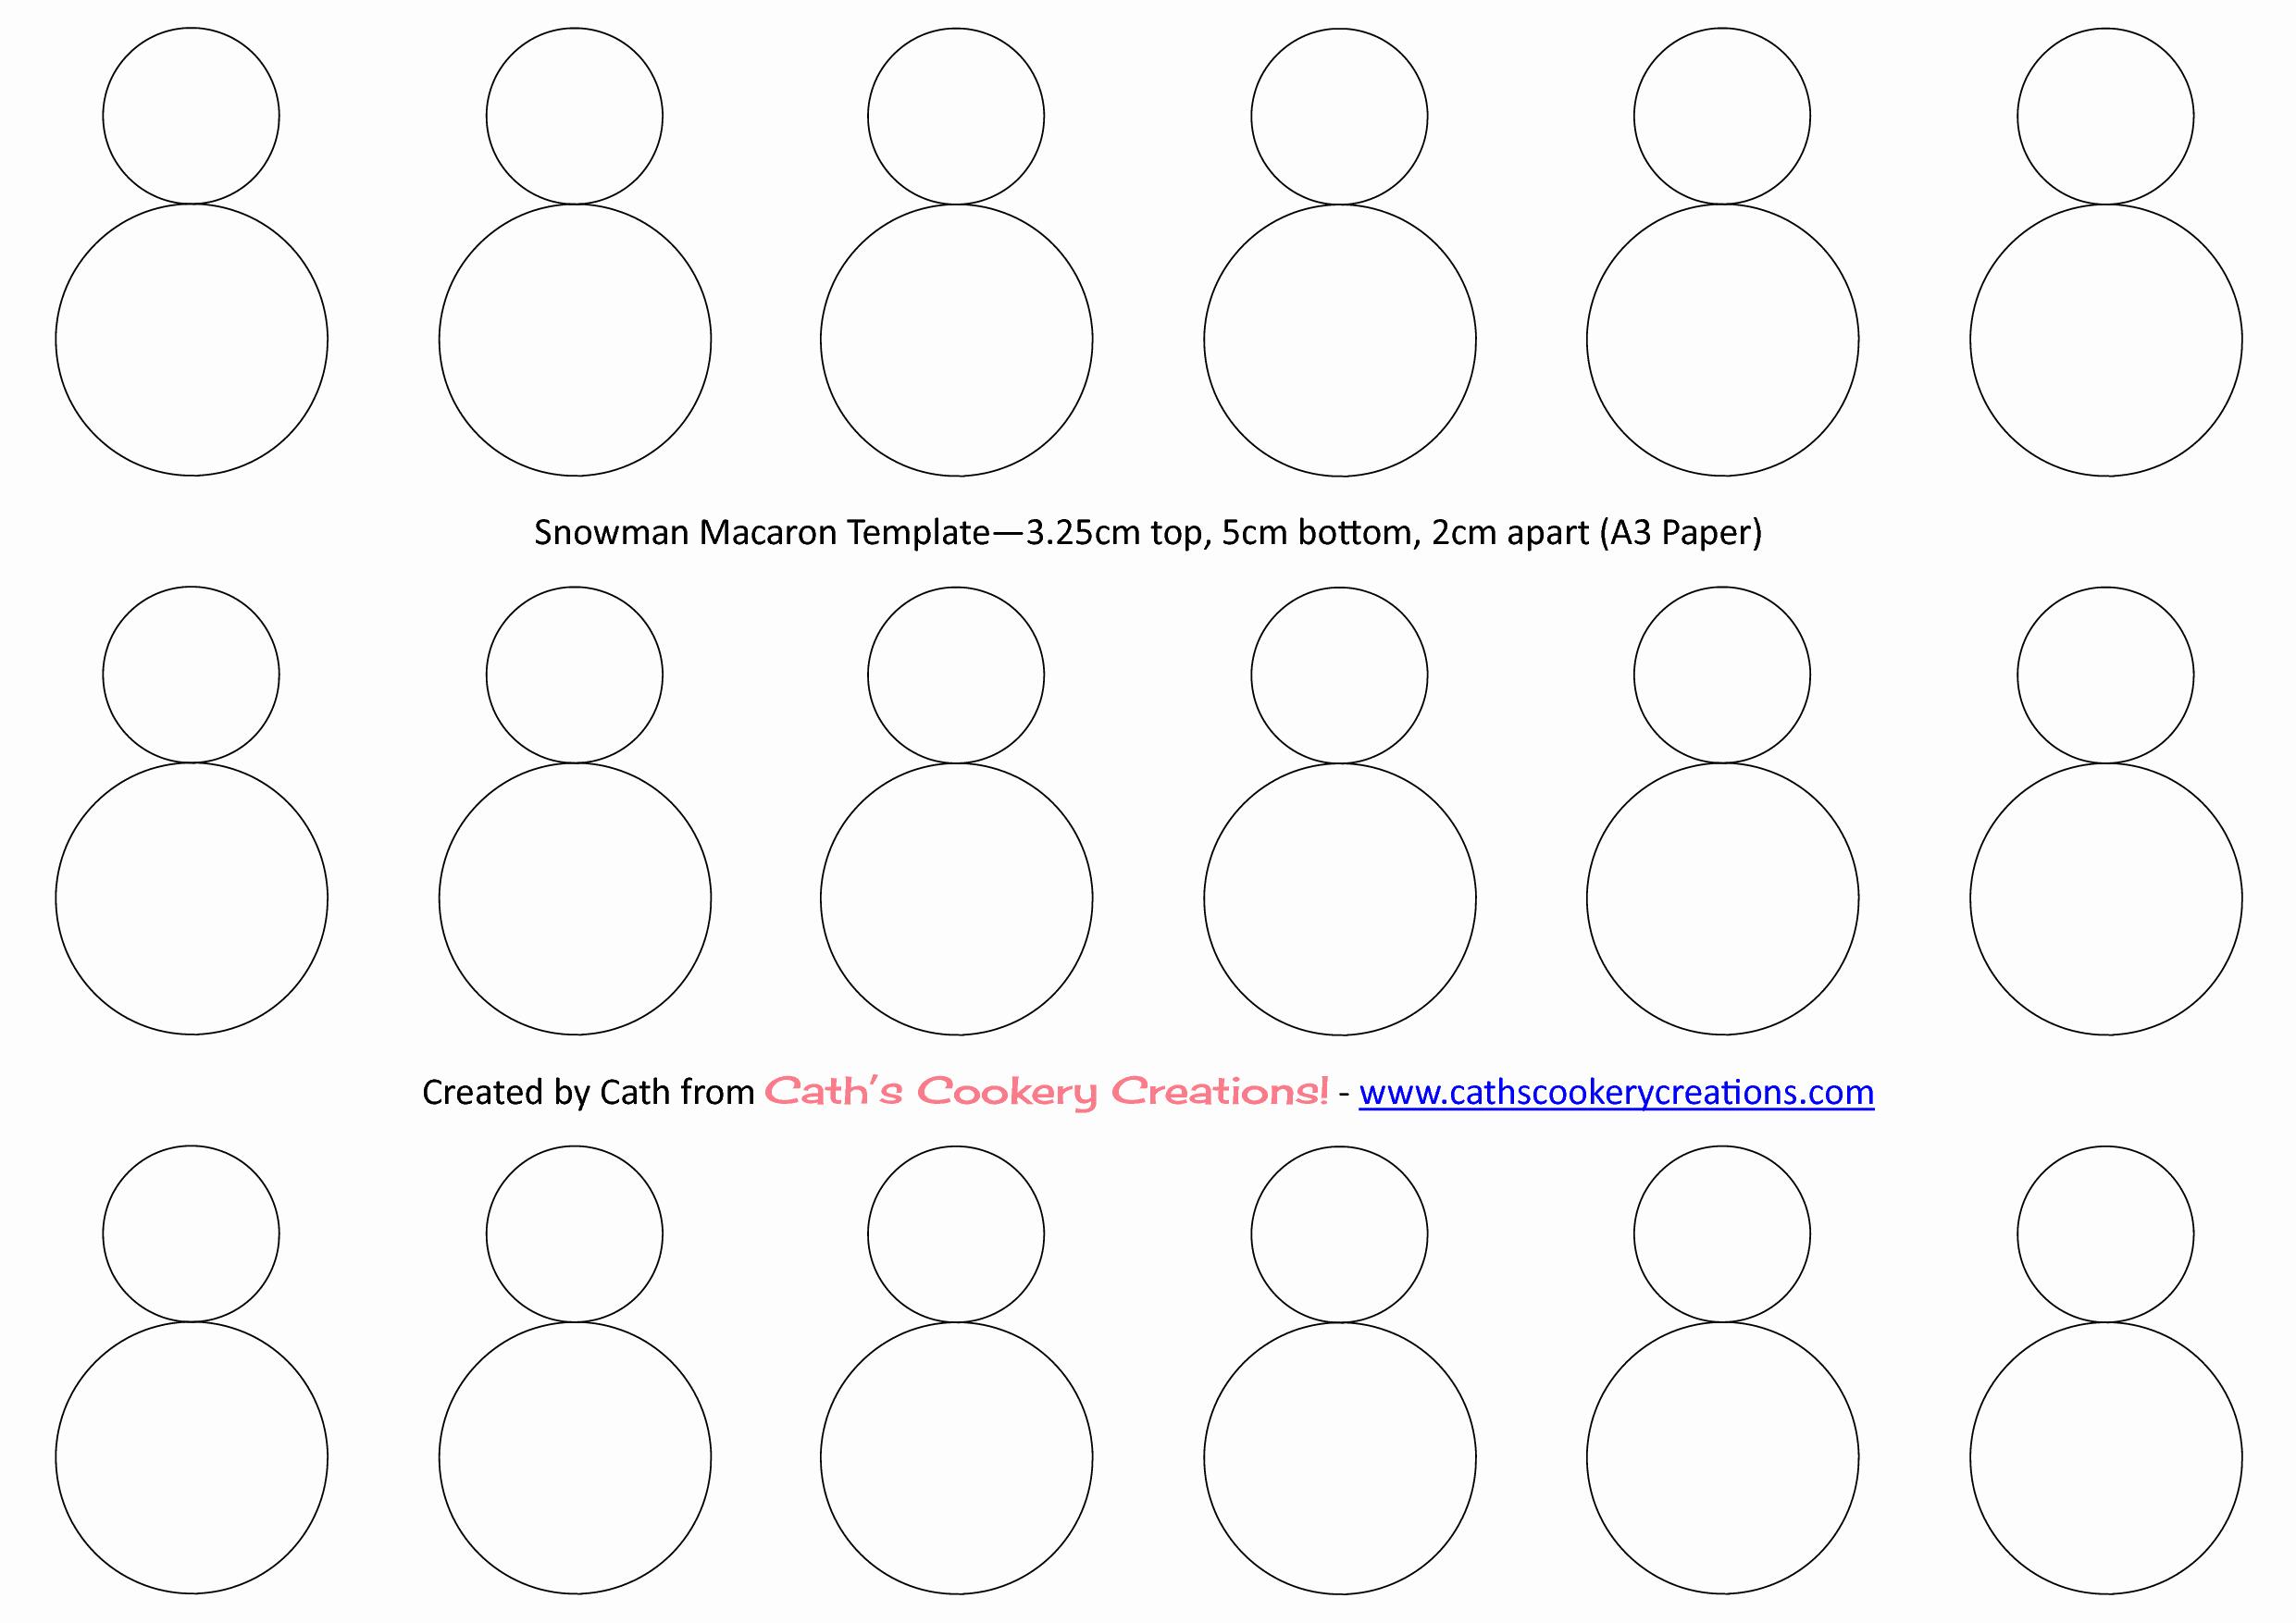 Macaron Template Printable Elegant Snowman Template Macarons Pinterest